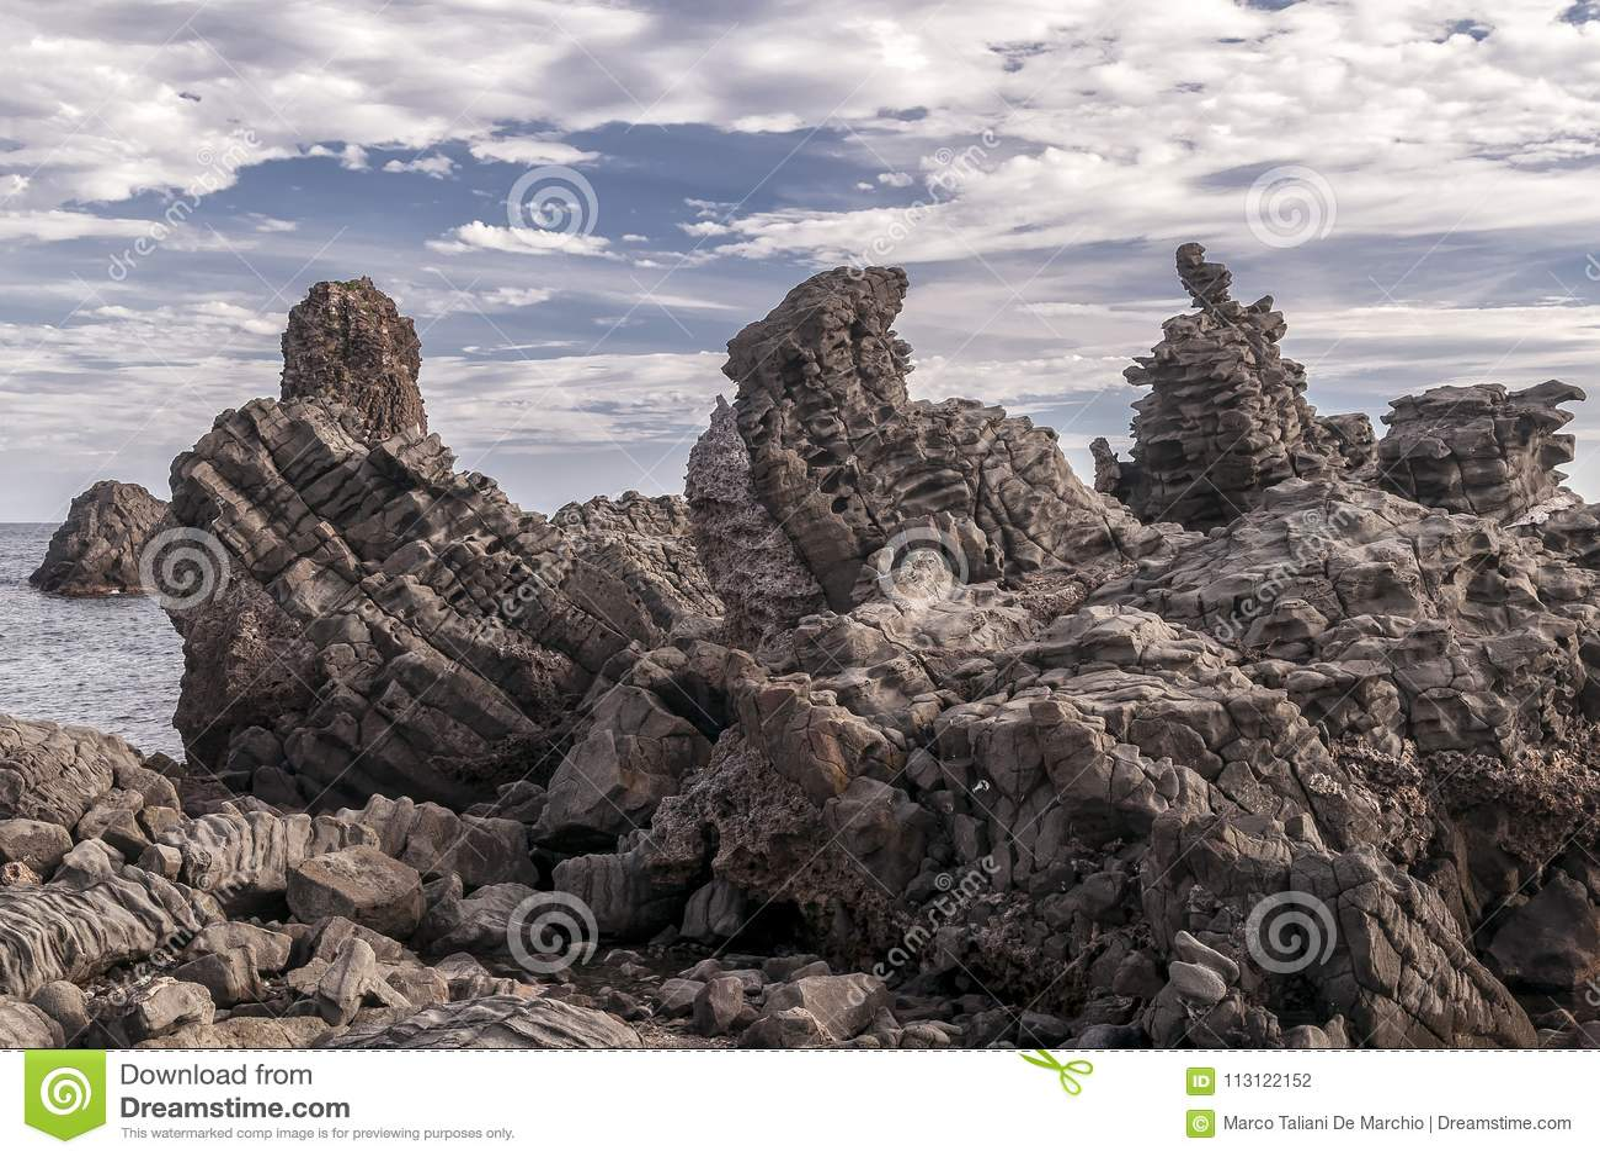 Die berühmten Felsen von Aci Trezza, Catania, Sizilien, Italien